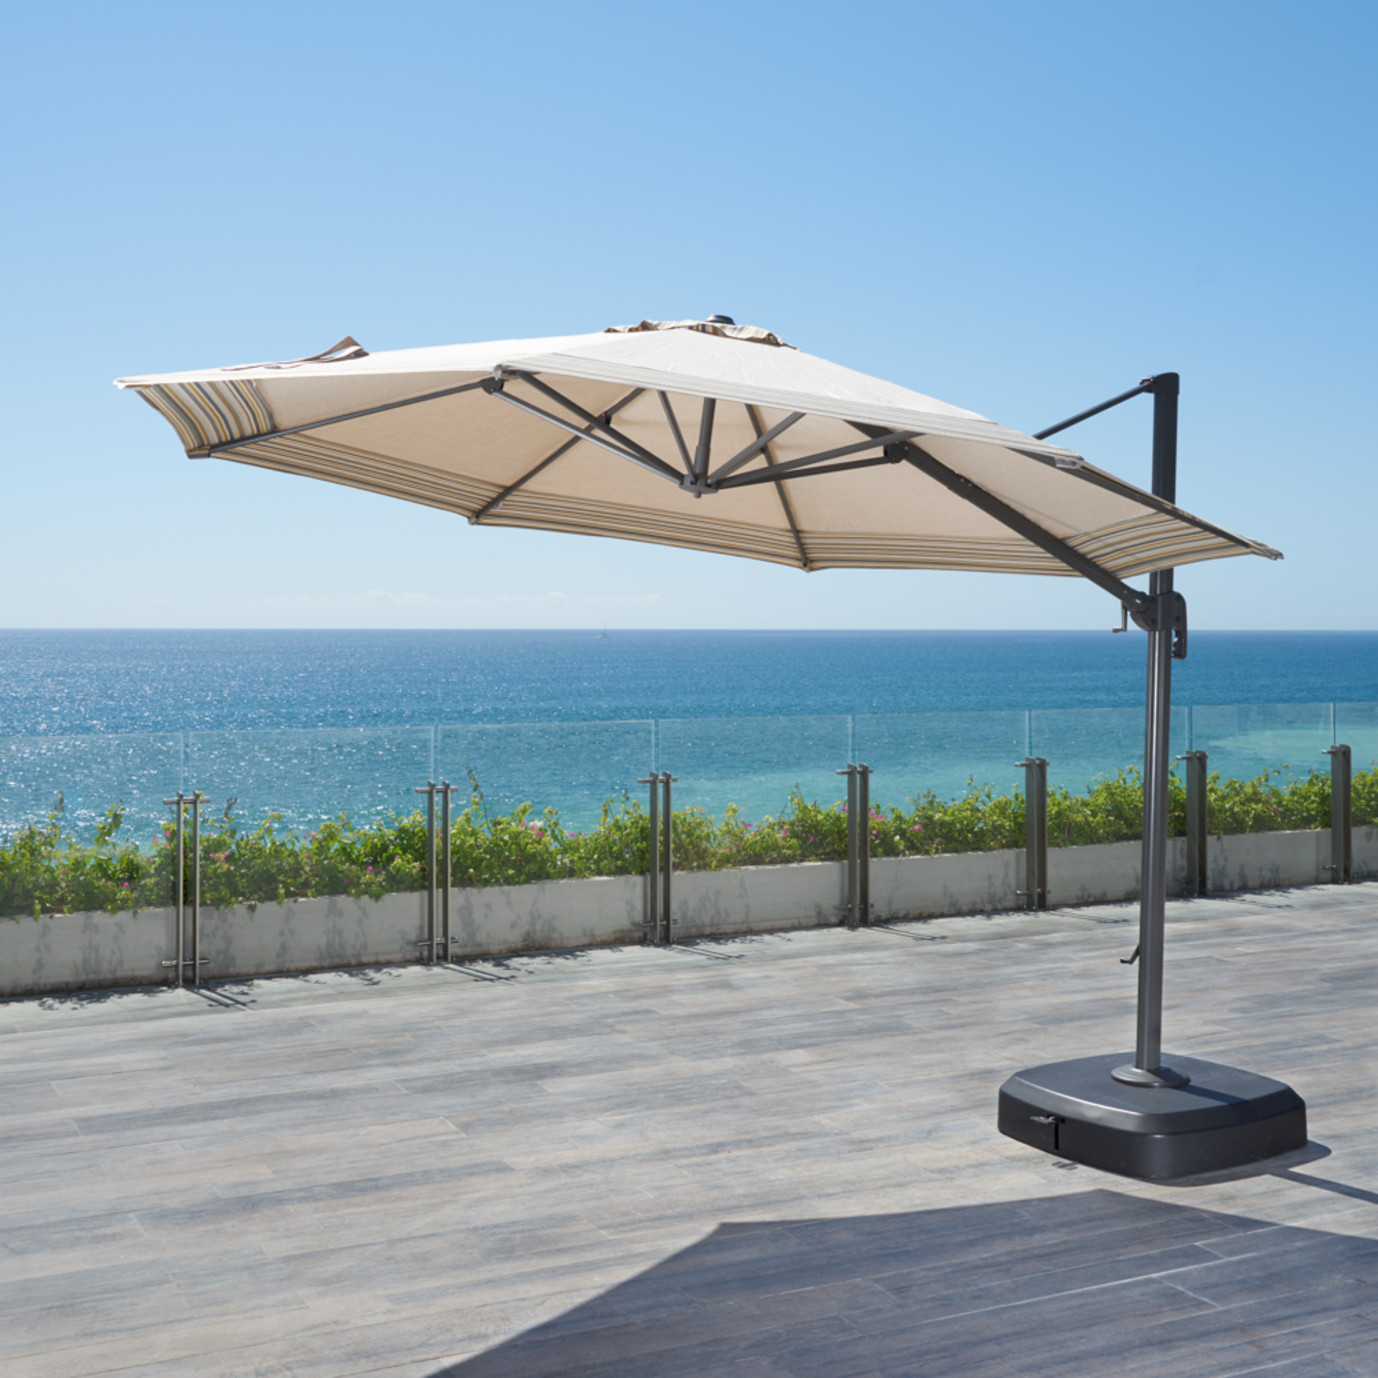 Vistano 11ft Grand Umbrella Canvas Flax Rst Brands